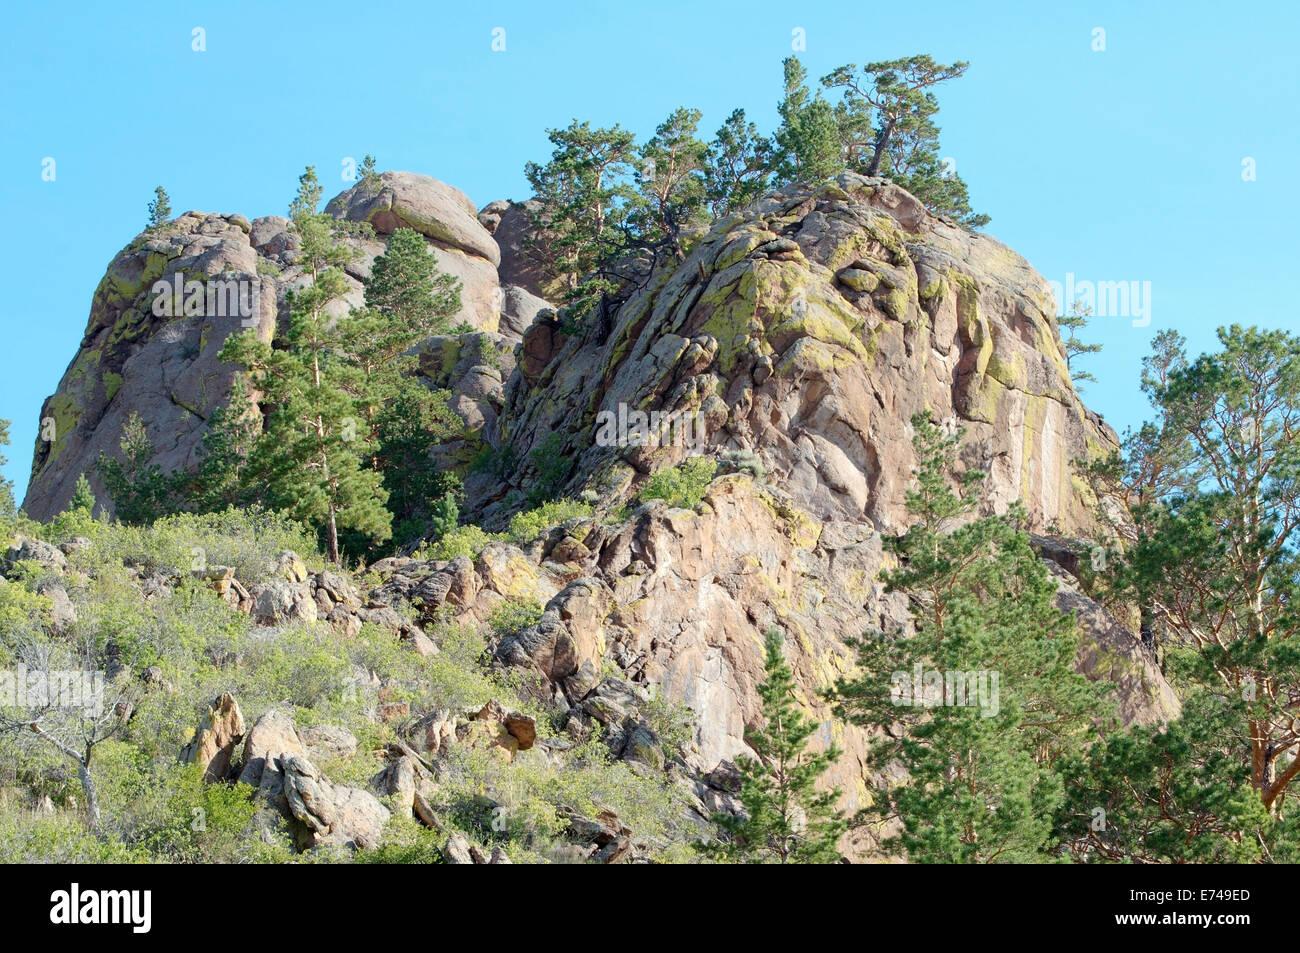 Merkit tract, Buryatia, Siberia, Russian Federation - Stock Image